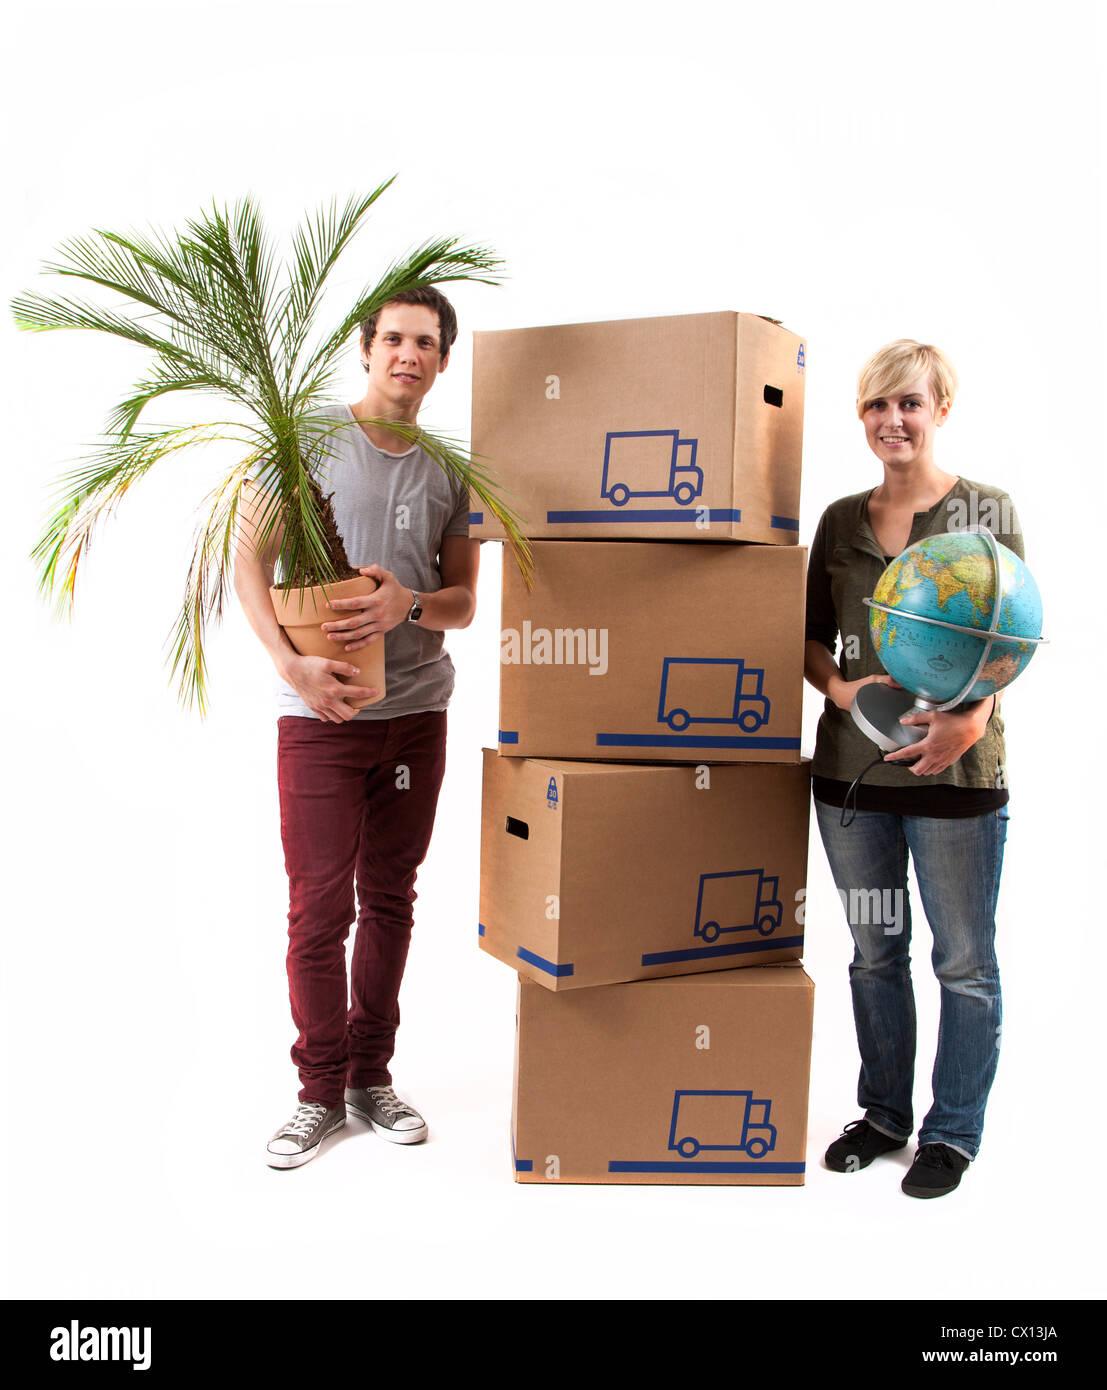 Symbolfoto Umzug, Auszug, umziehen. Junges Paar mit Umzugskartons Globus und Zimmerpflanze. Umzugskisten aus Pappkarton. Stock Photo